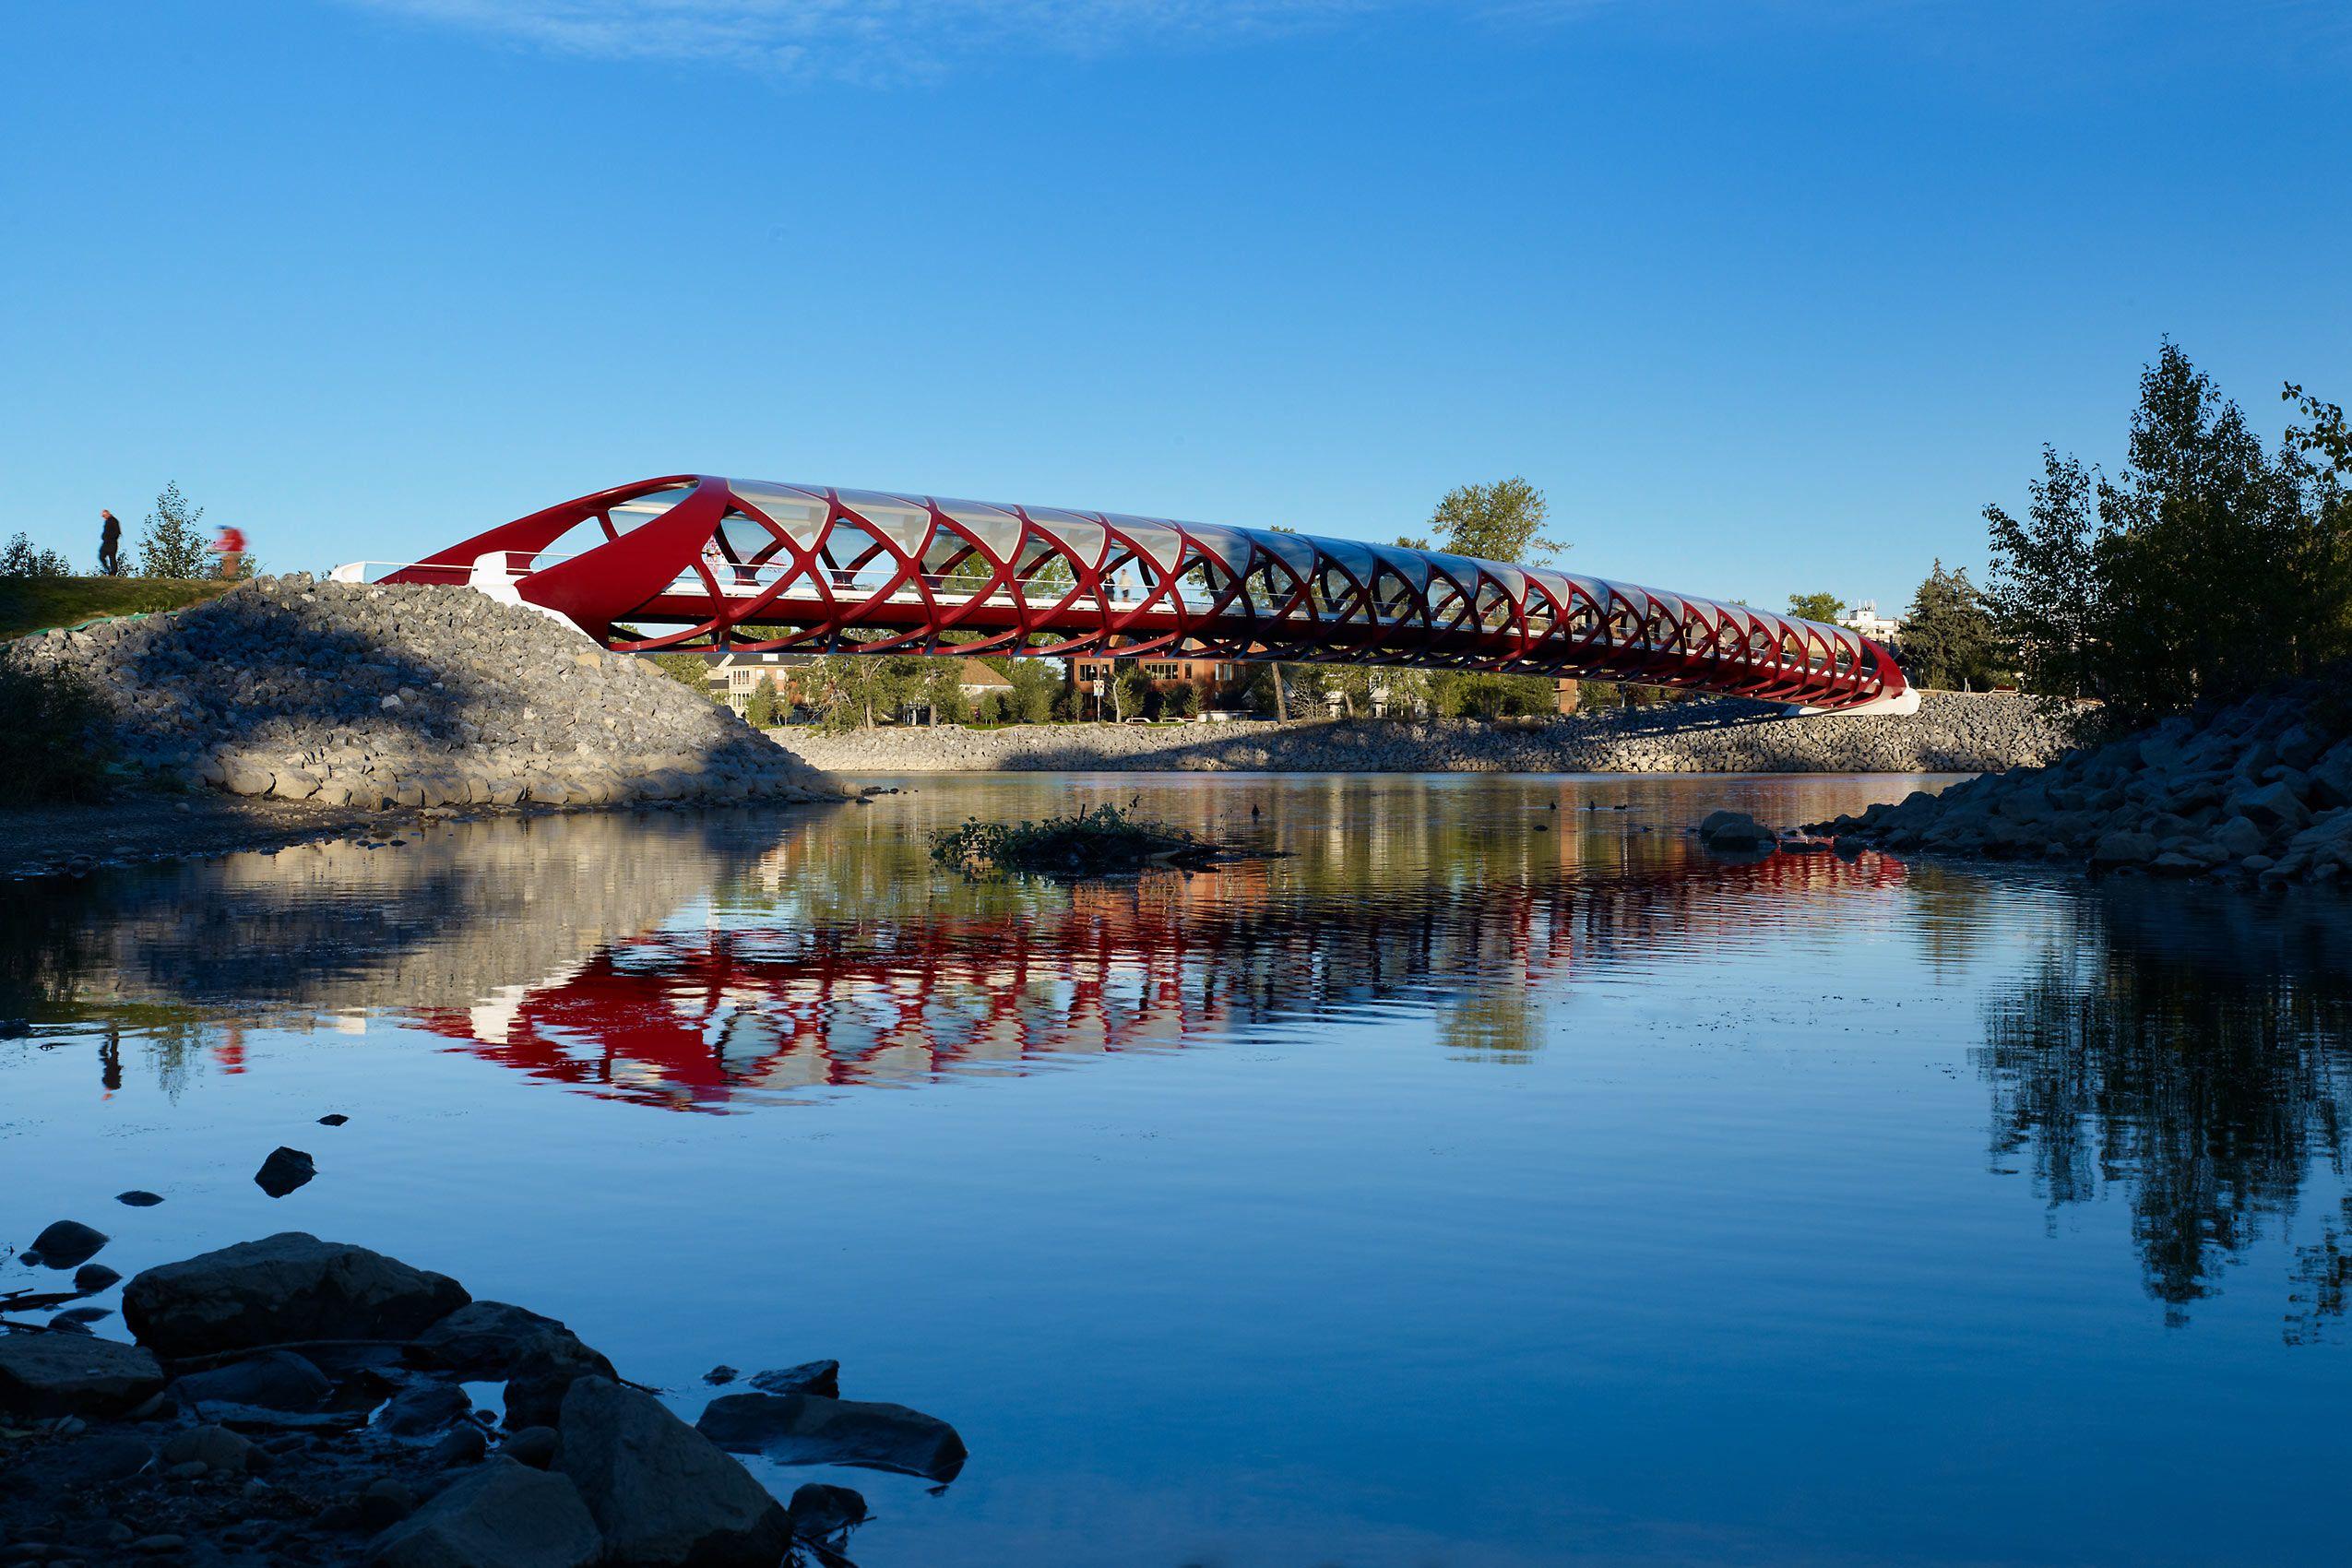 SANTIAGO CALATRAVA  .  PEACE BRIDGE  .  CALGARY CANADA